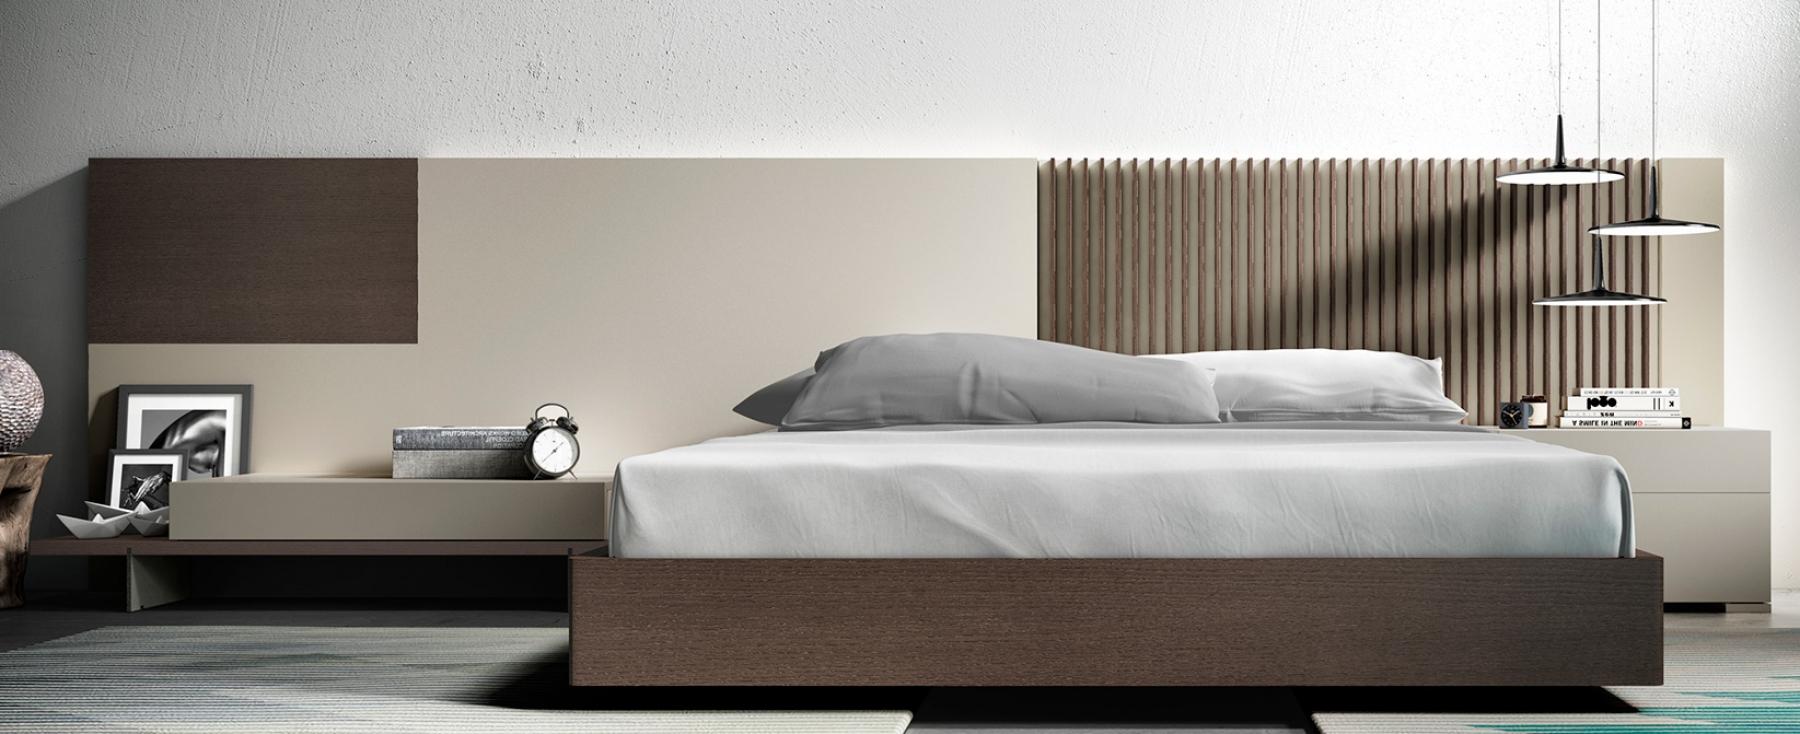 Kubik Muebles J7do Dormitorios Emede Mobiliario De Diseà O